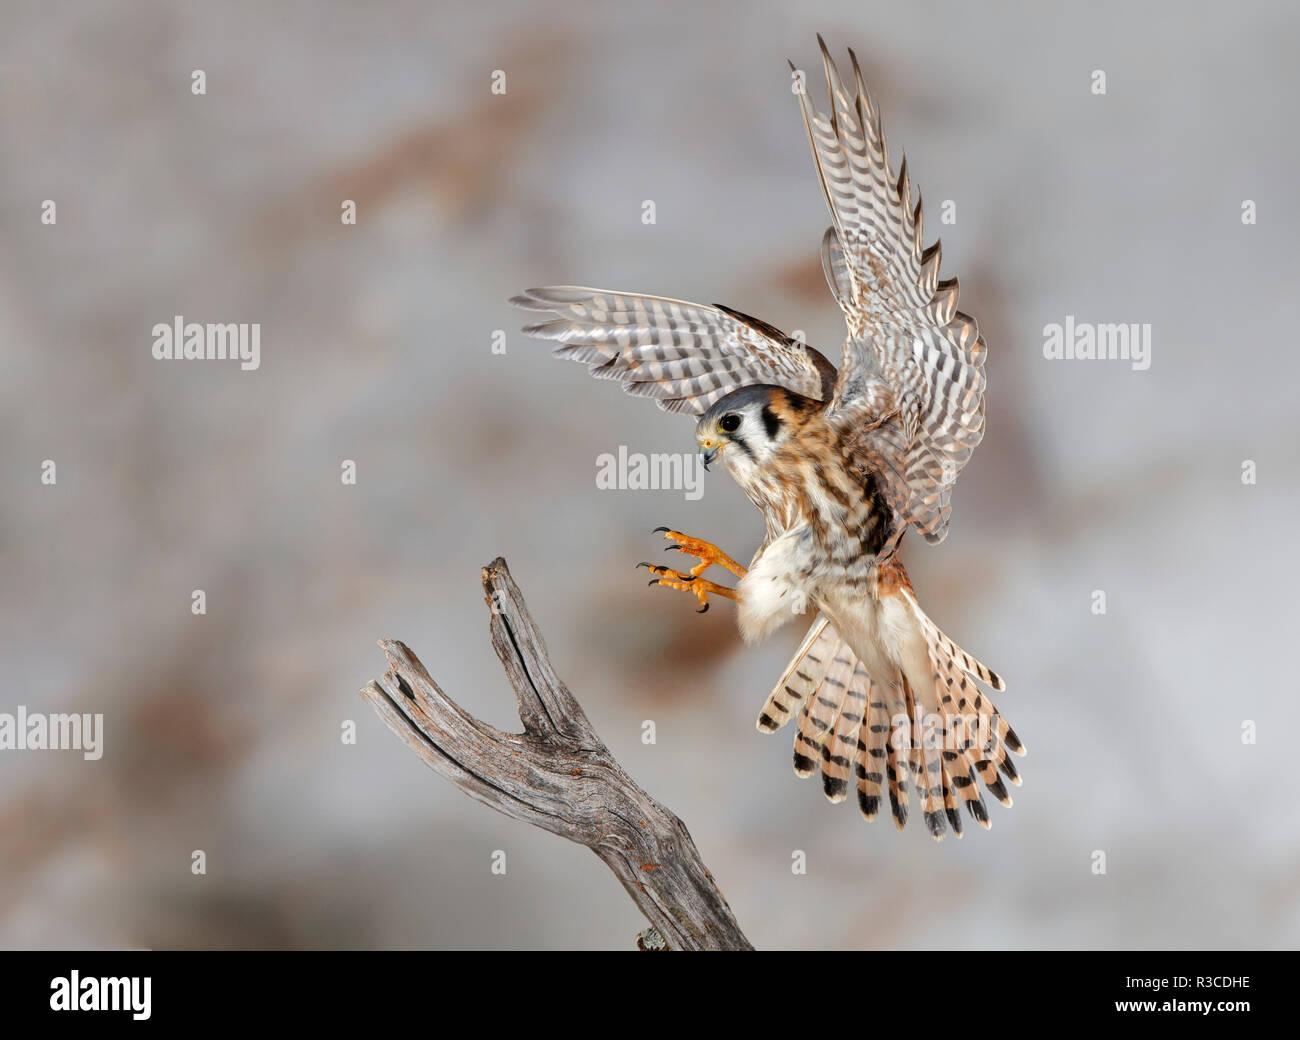 Weibliche Amerikanische kestrel Landung, Louisville, Kentucky, Falco sparverius Stockbild